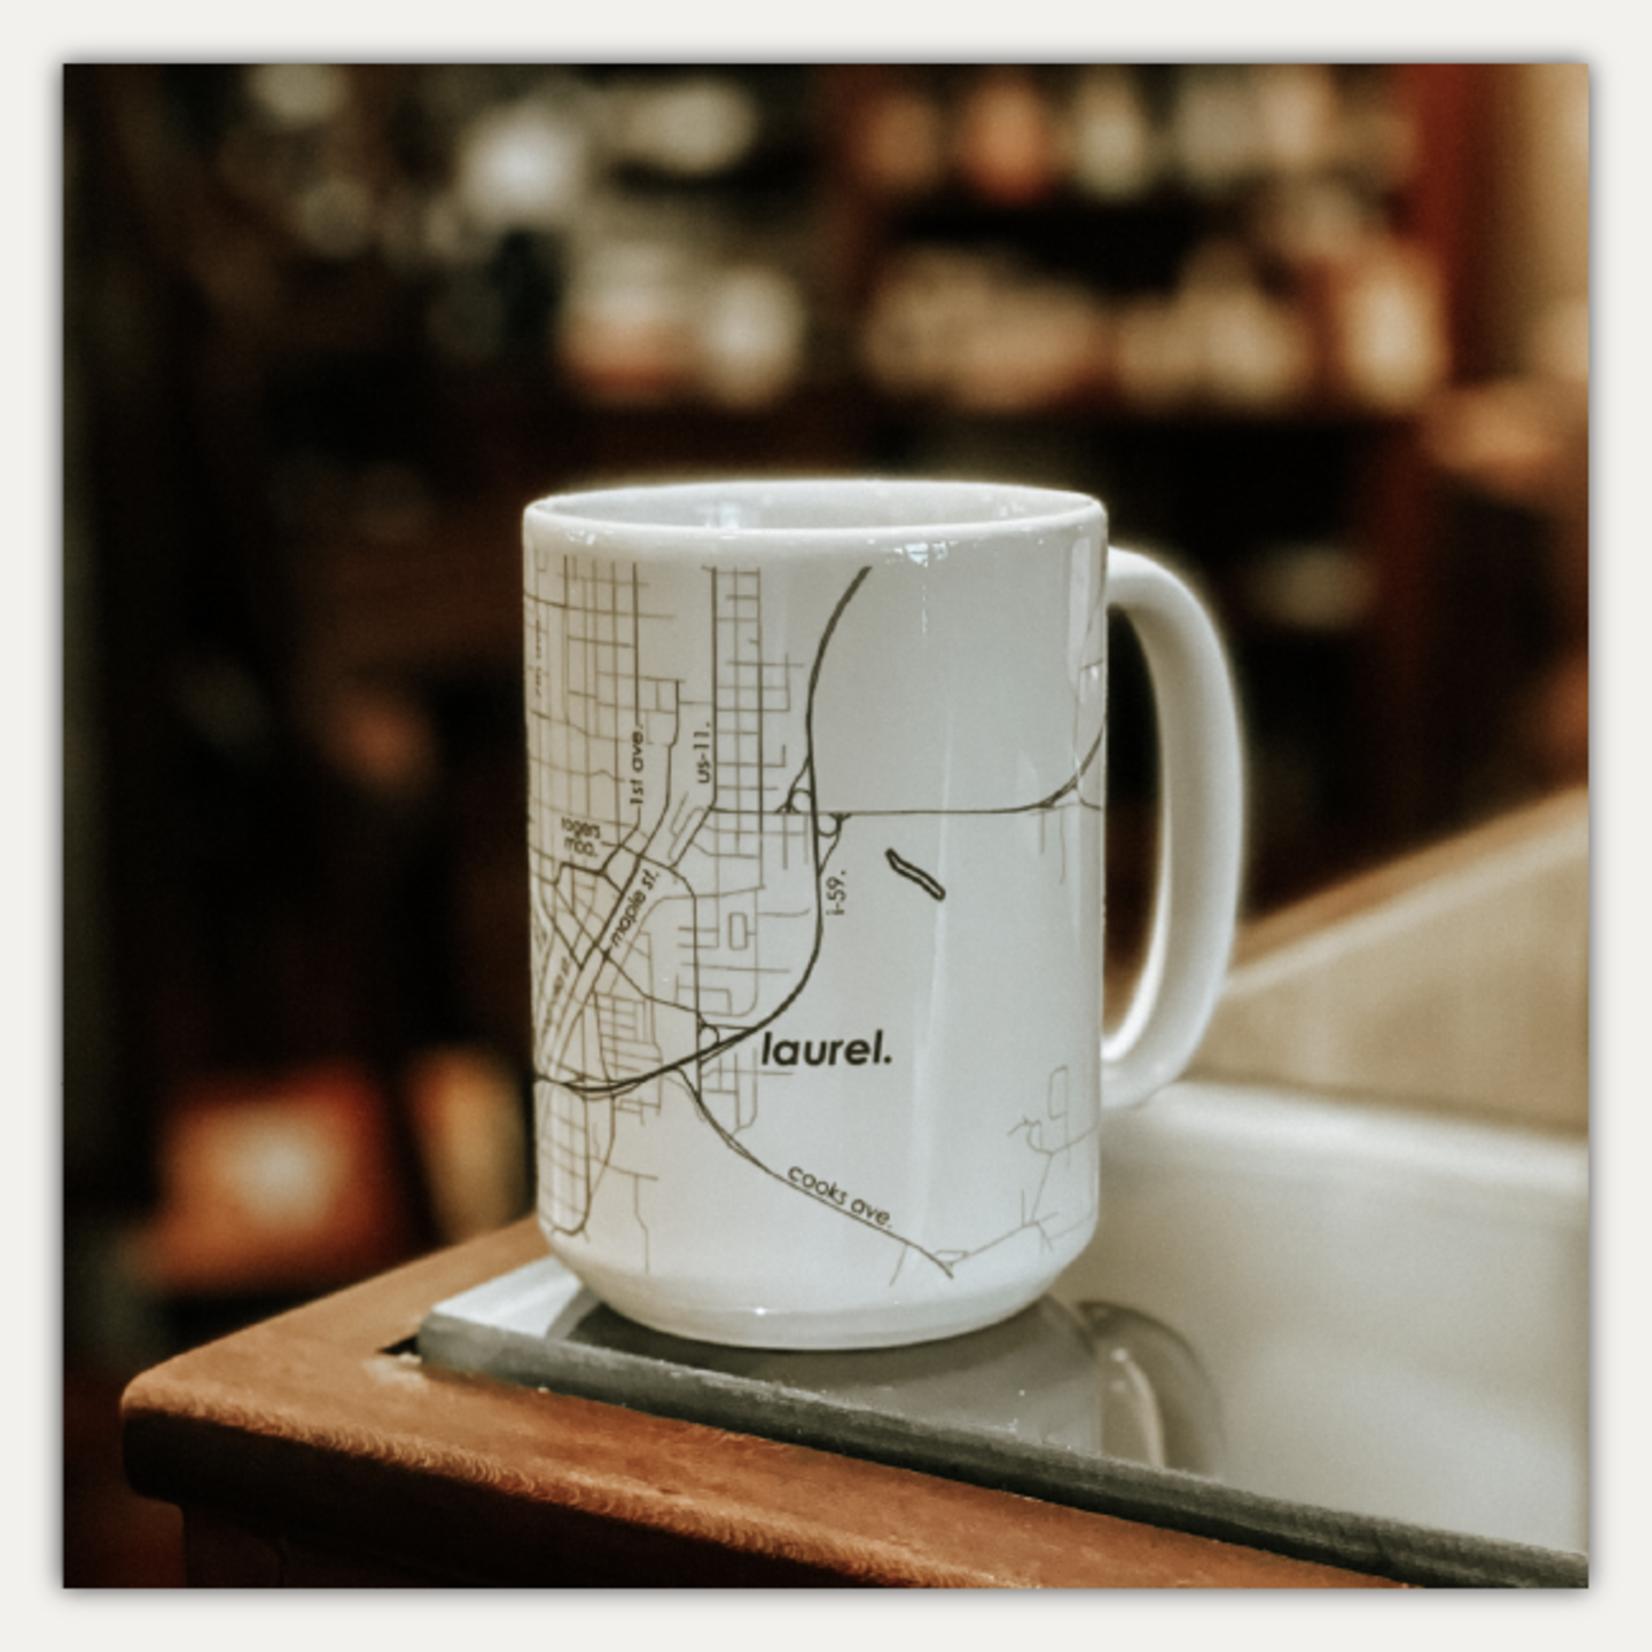 Well Told Laurel Map 15 oz Ceramic Mug